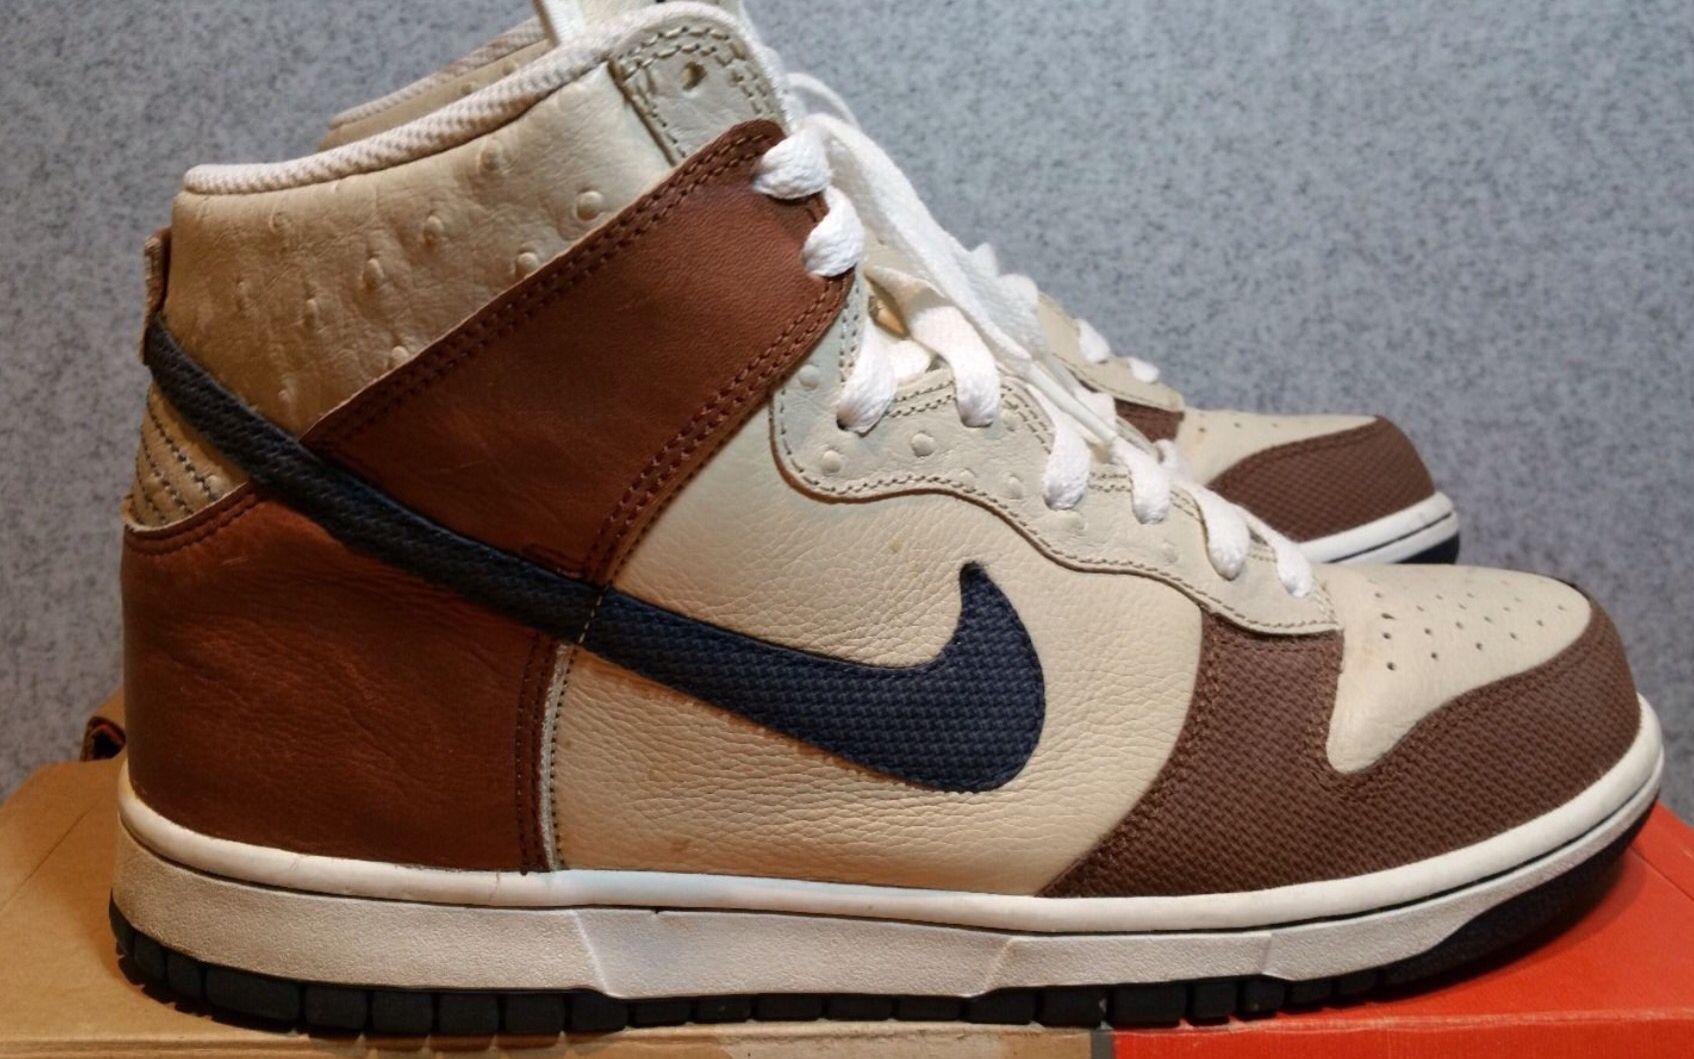 Nike Dunk SB Premium, tobacco Brown